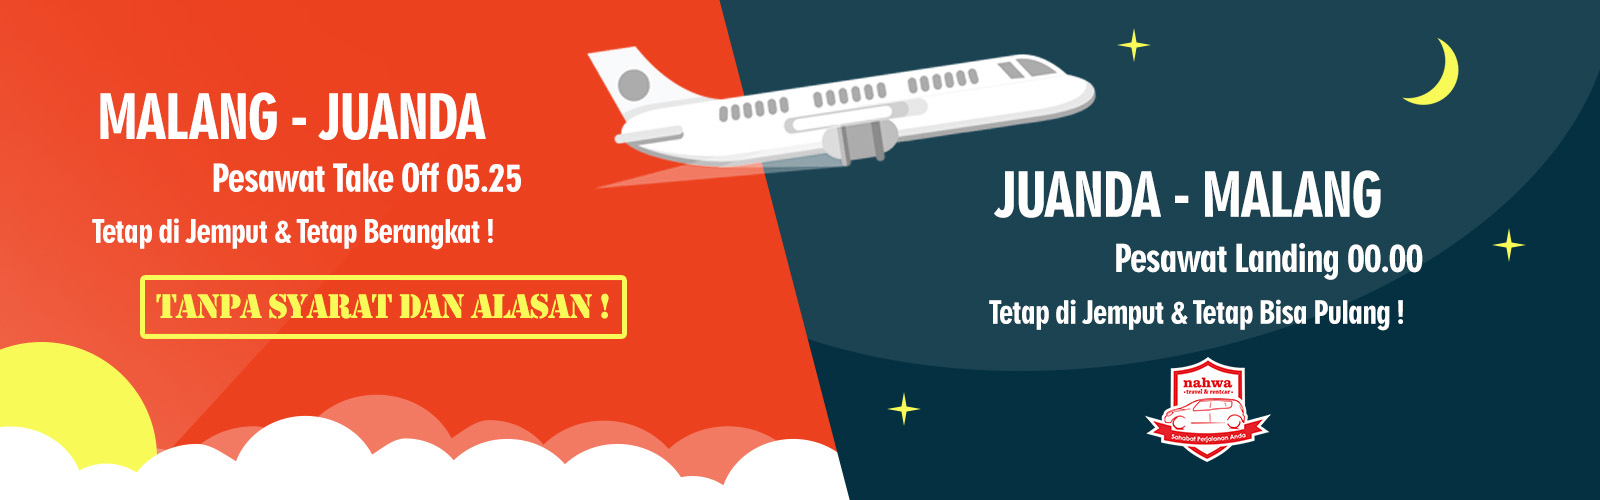 Travel Malang Juanda Murah dan Travel Malang Surabaya PP